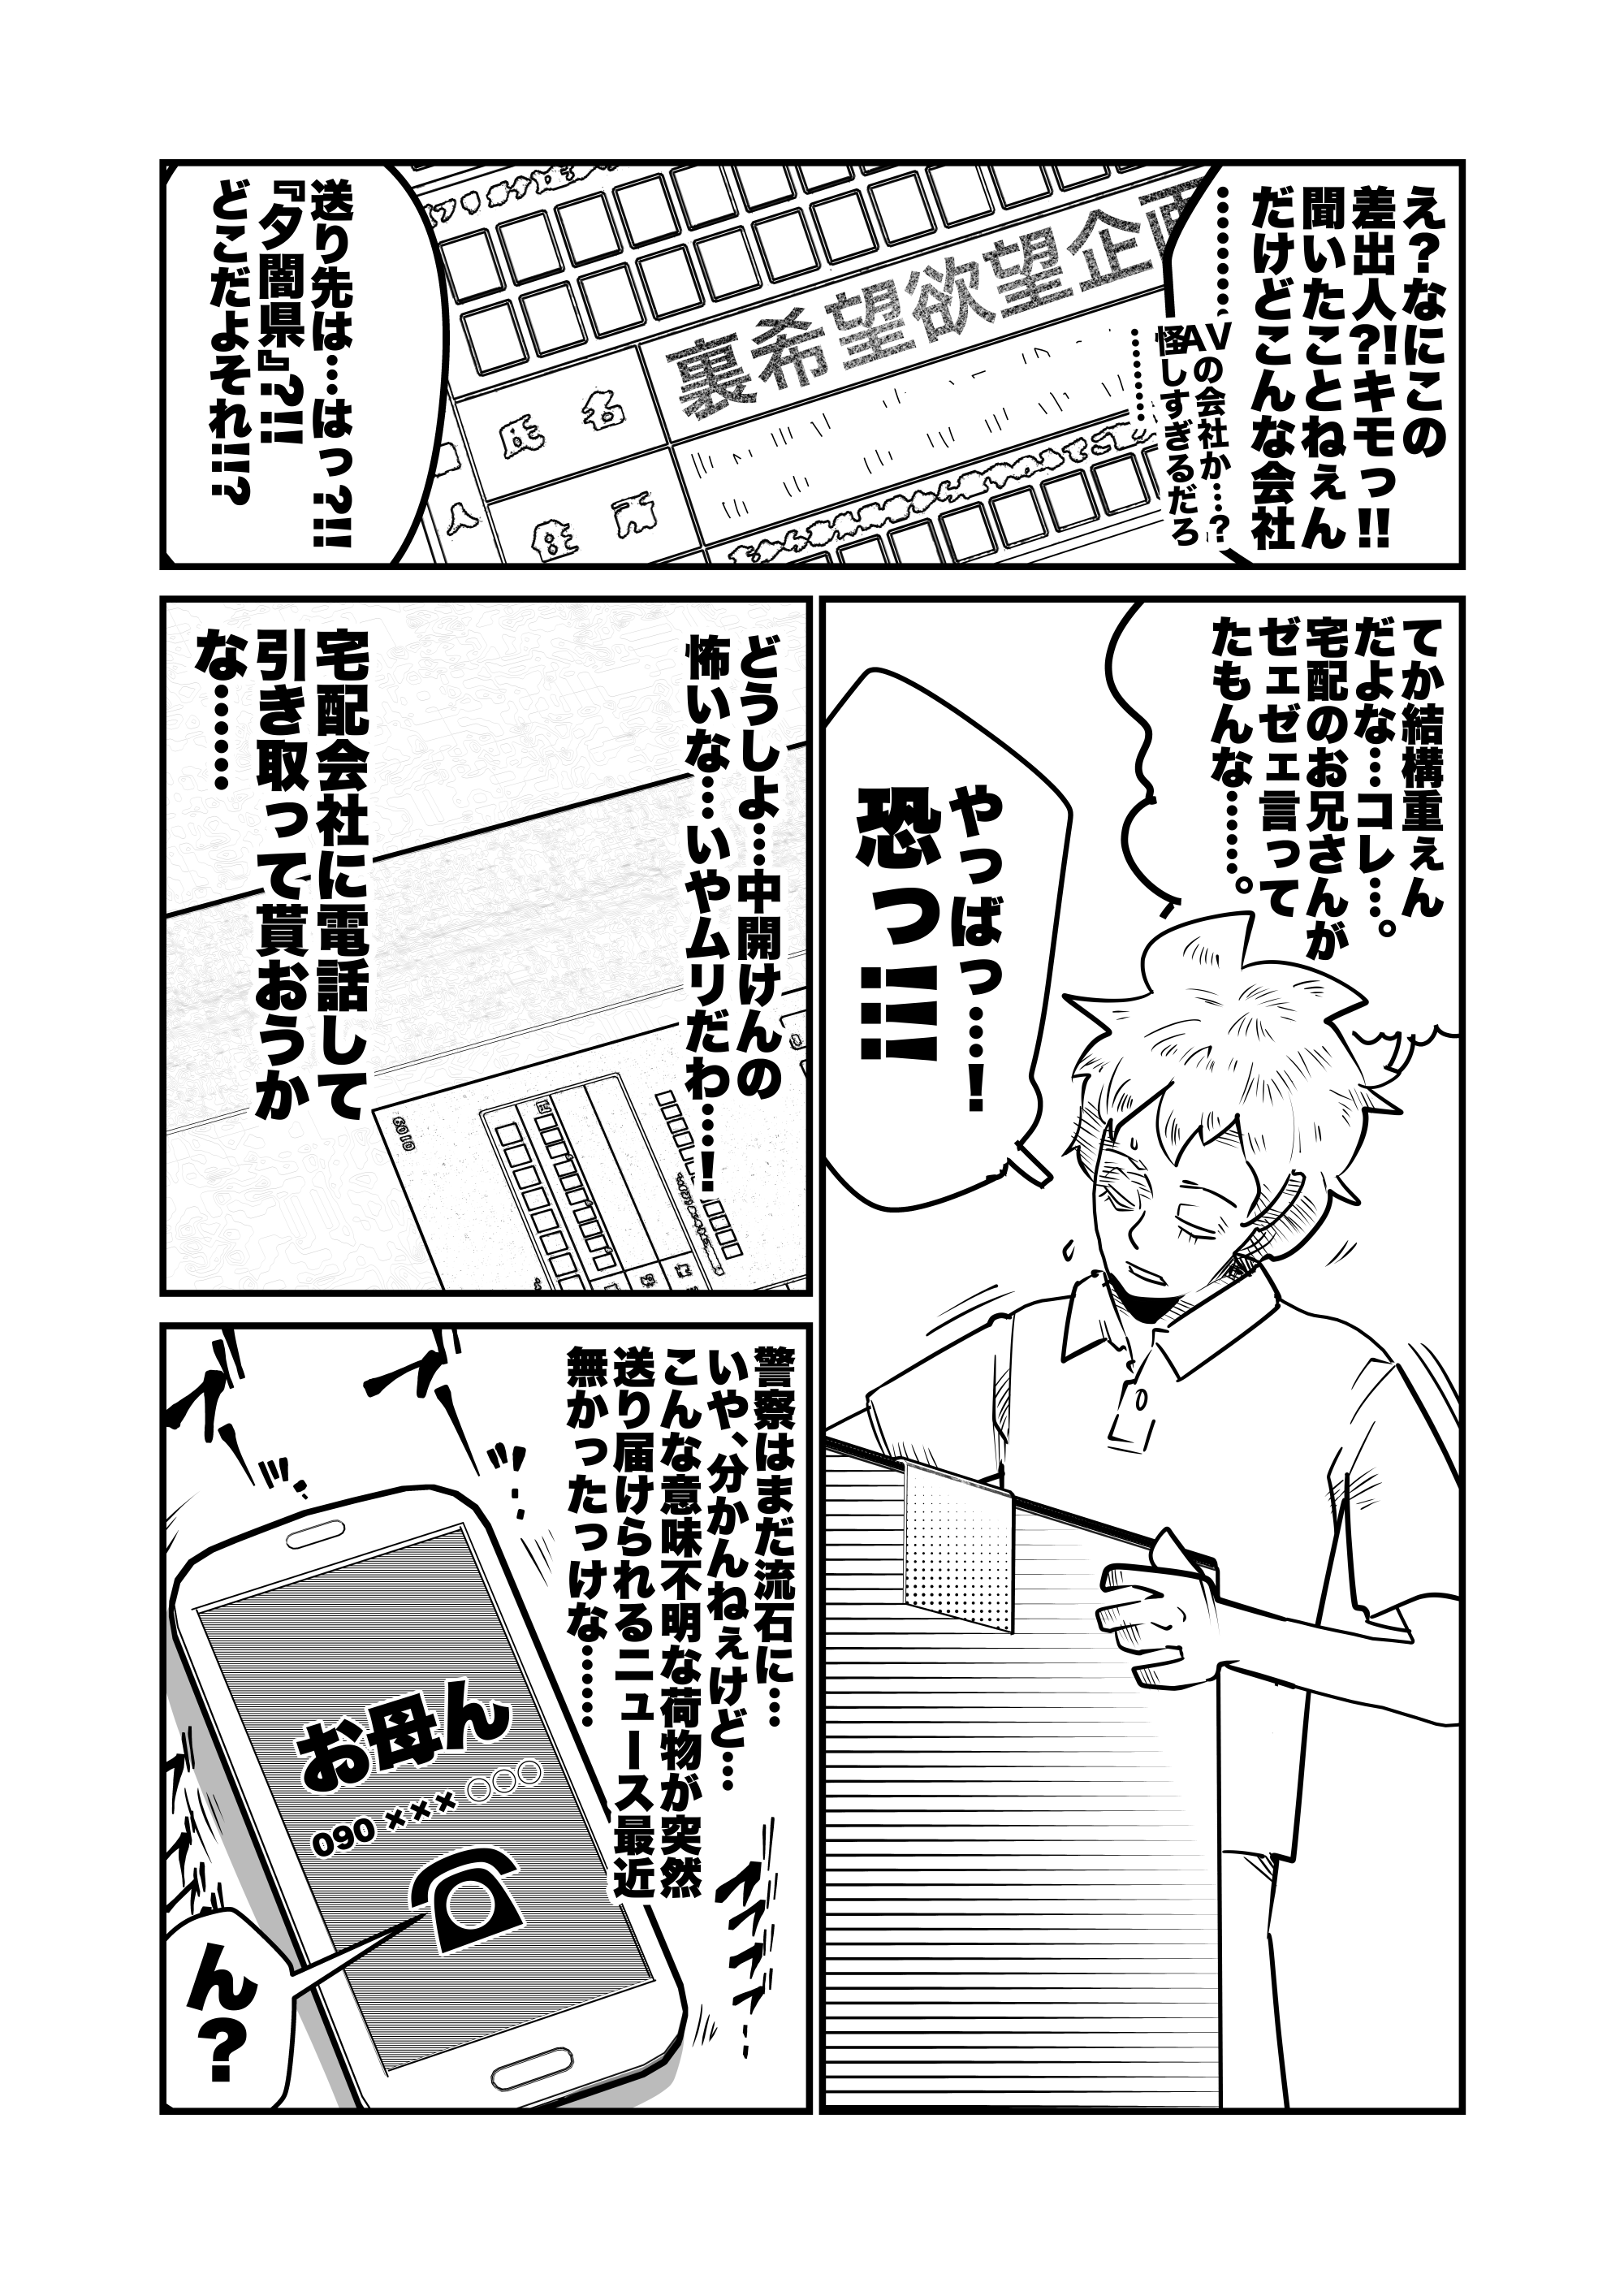 f:id:terashimaru117:20210915014133p:plain